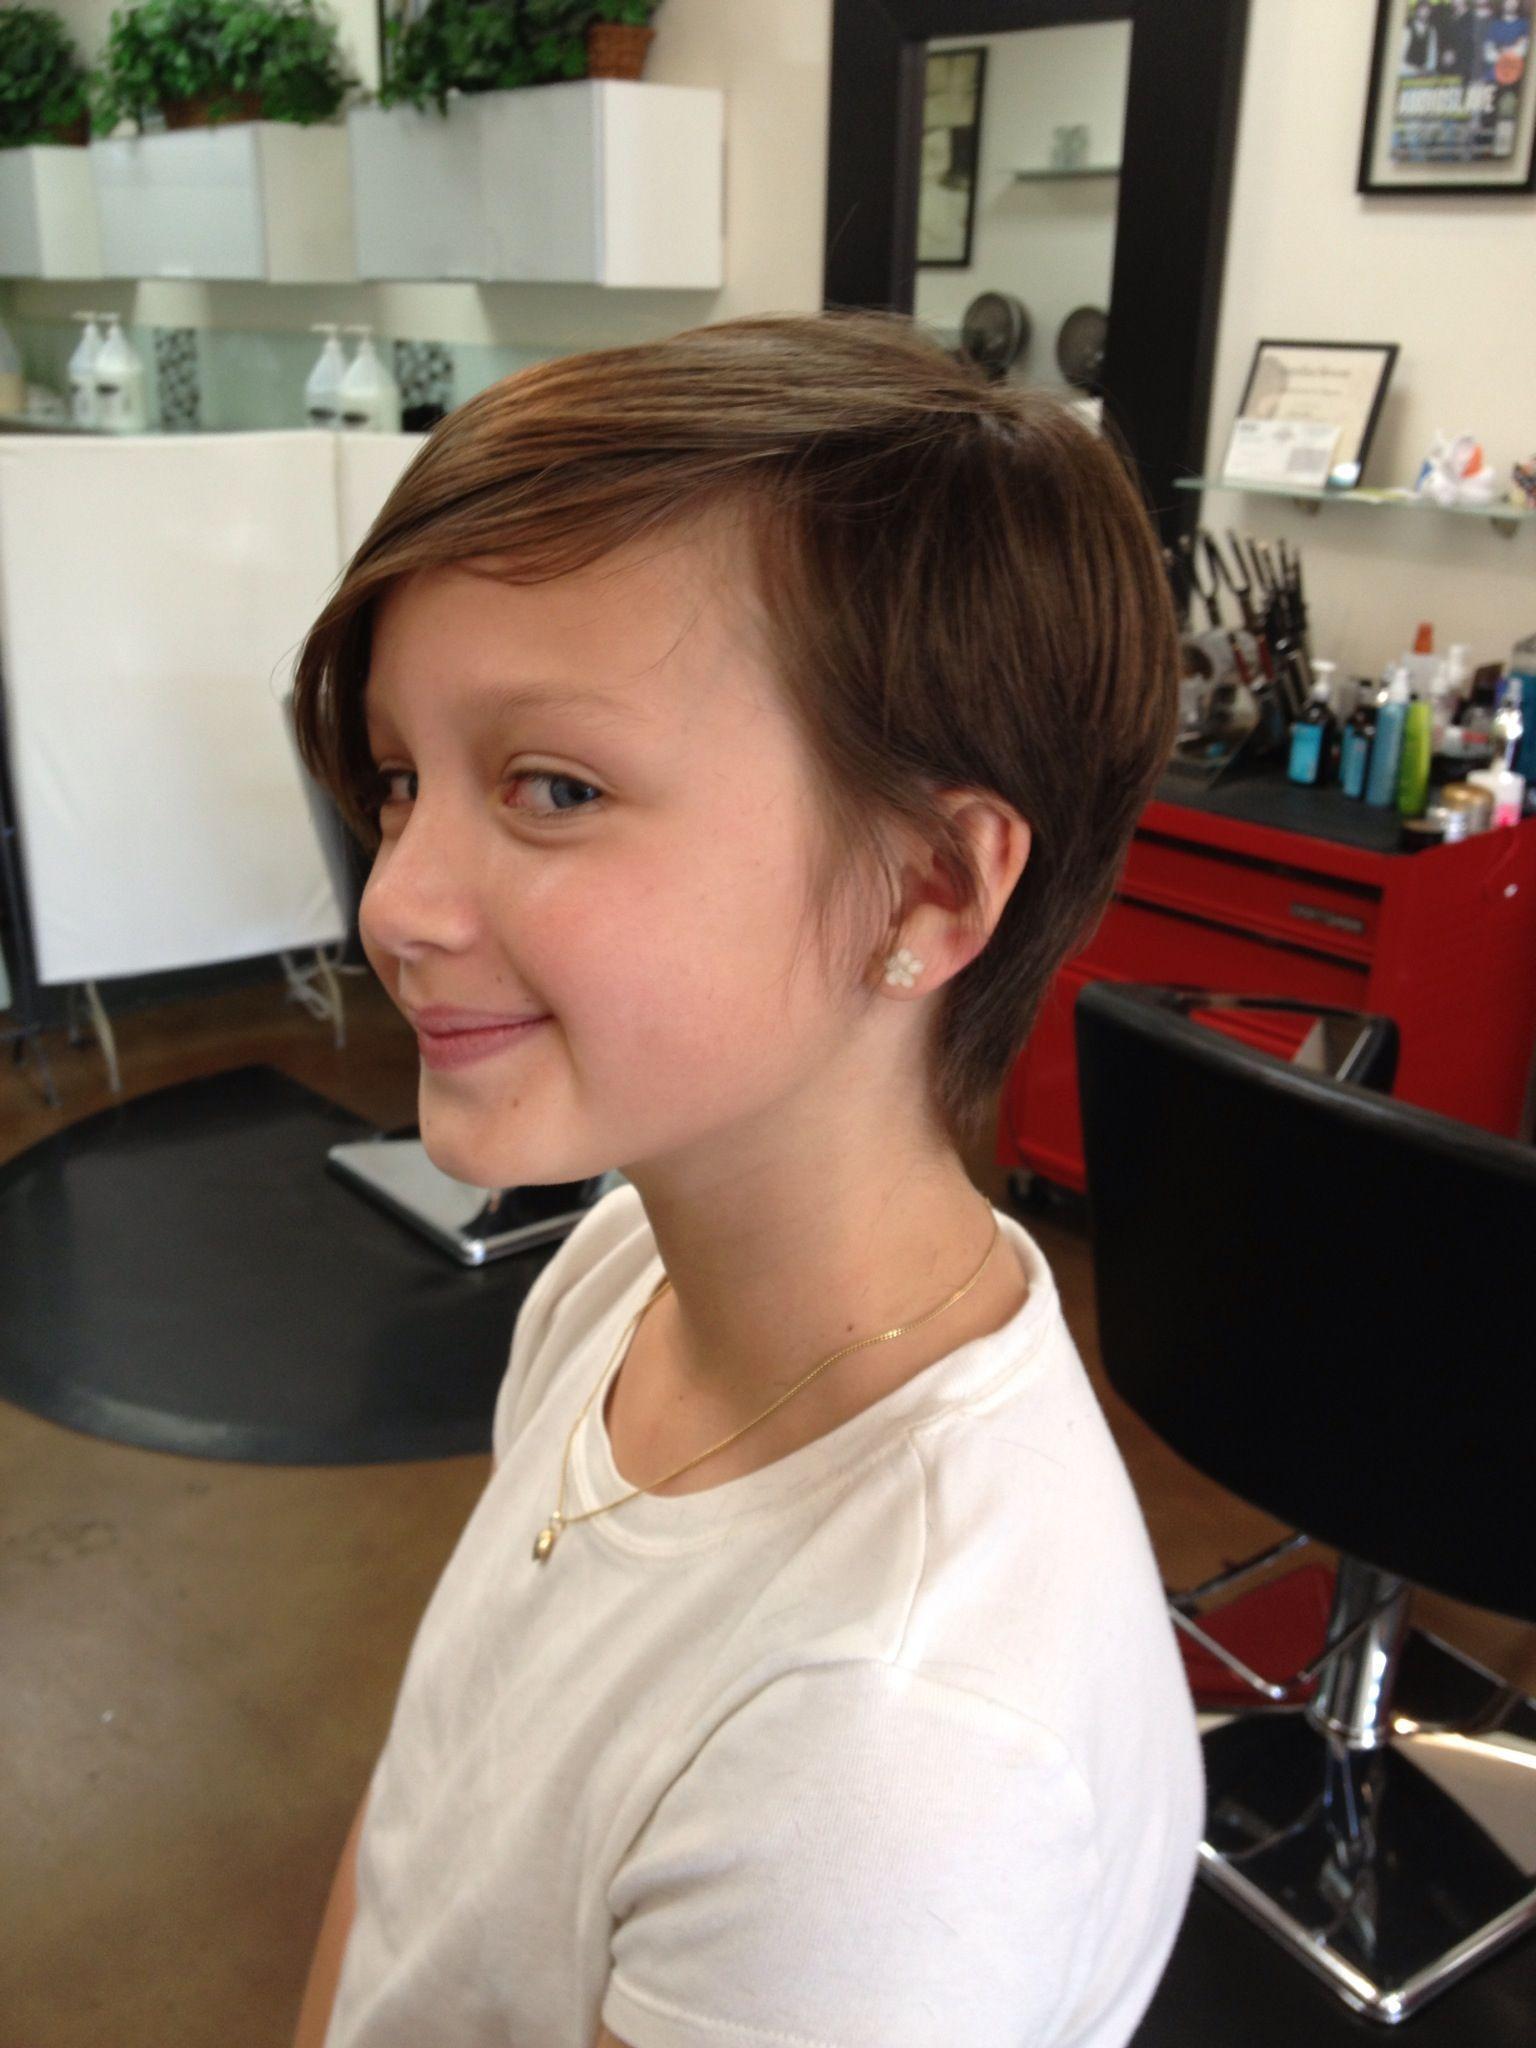 Schone Kinder Kurze Frisuren Kurzhaarfrisuren Madchen Haarschnitt